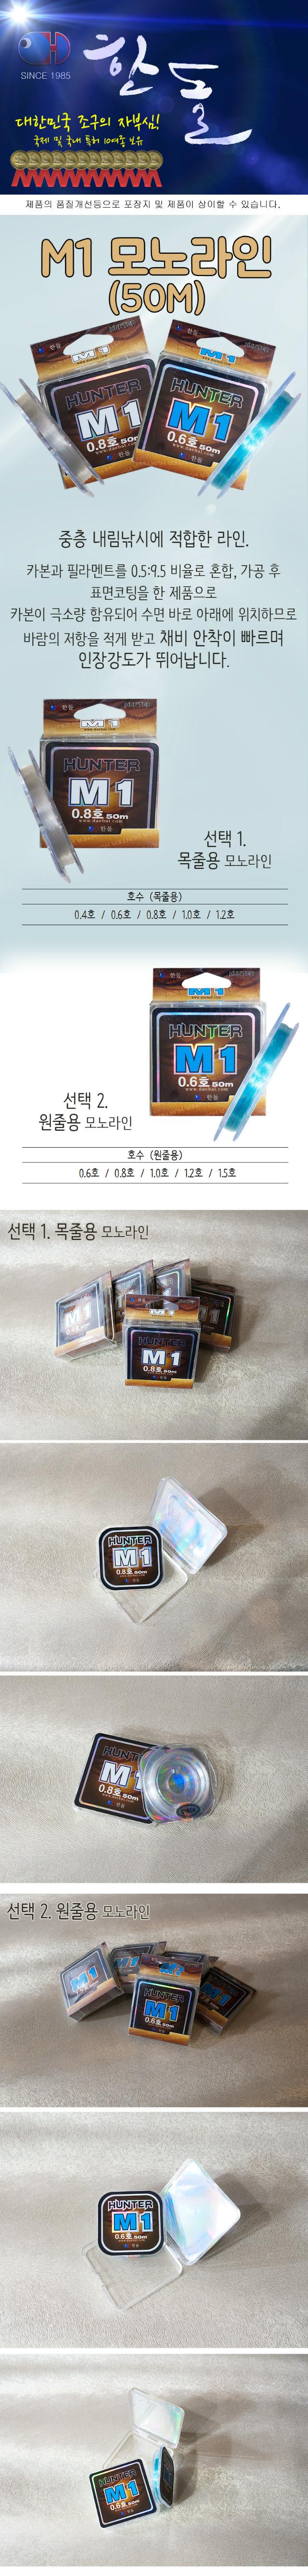 M1 모노라인.jpg